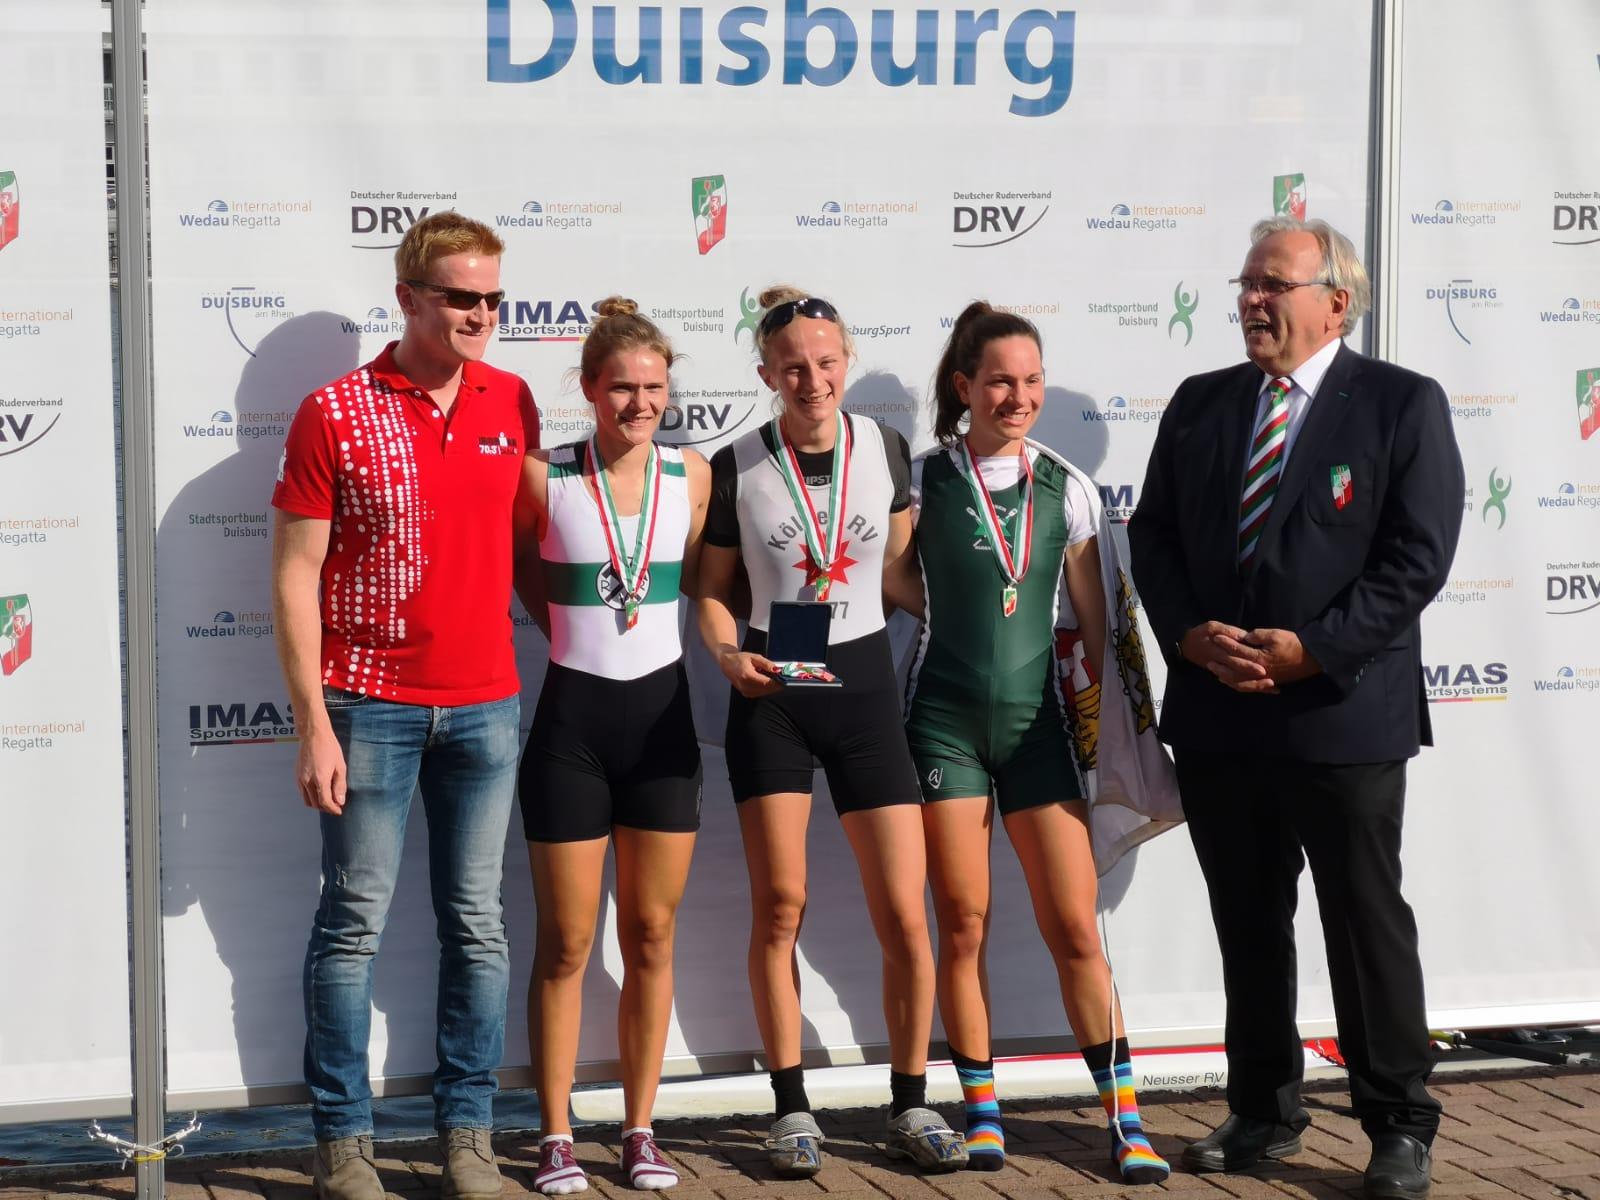 Landesmeisterschaften in Duisburg